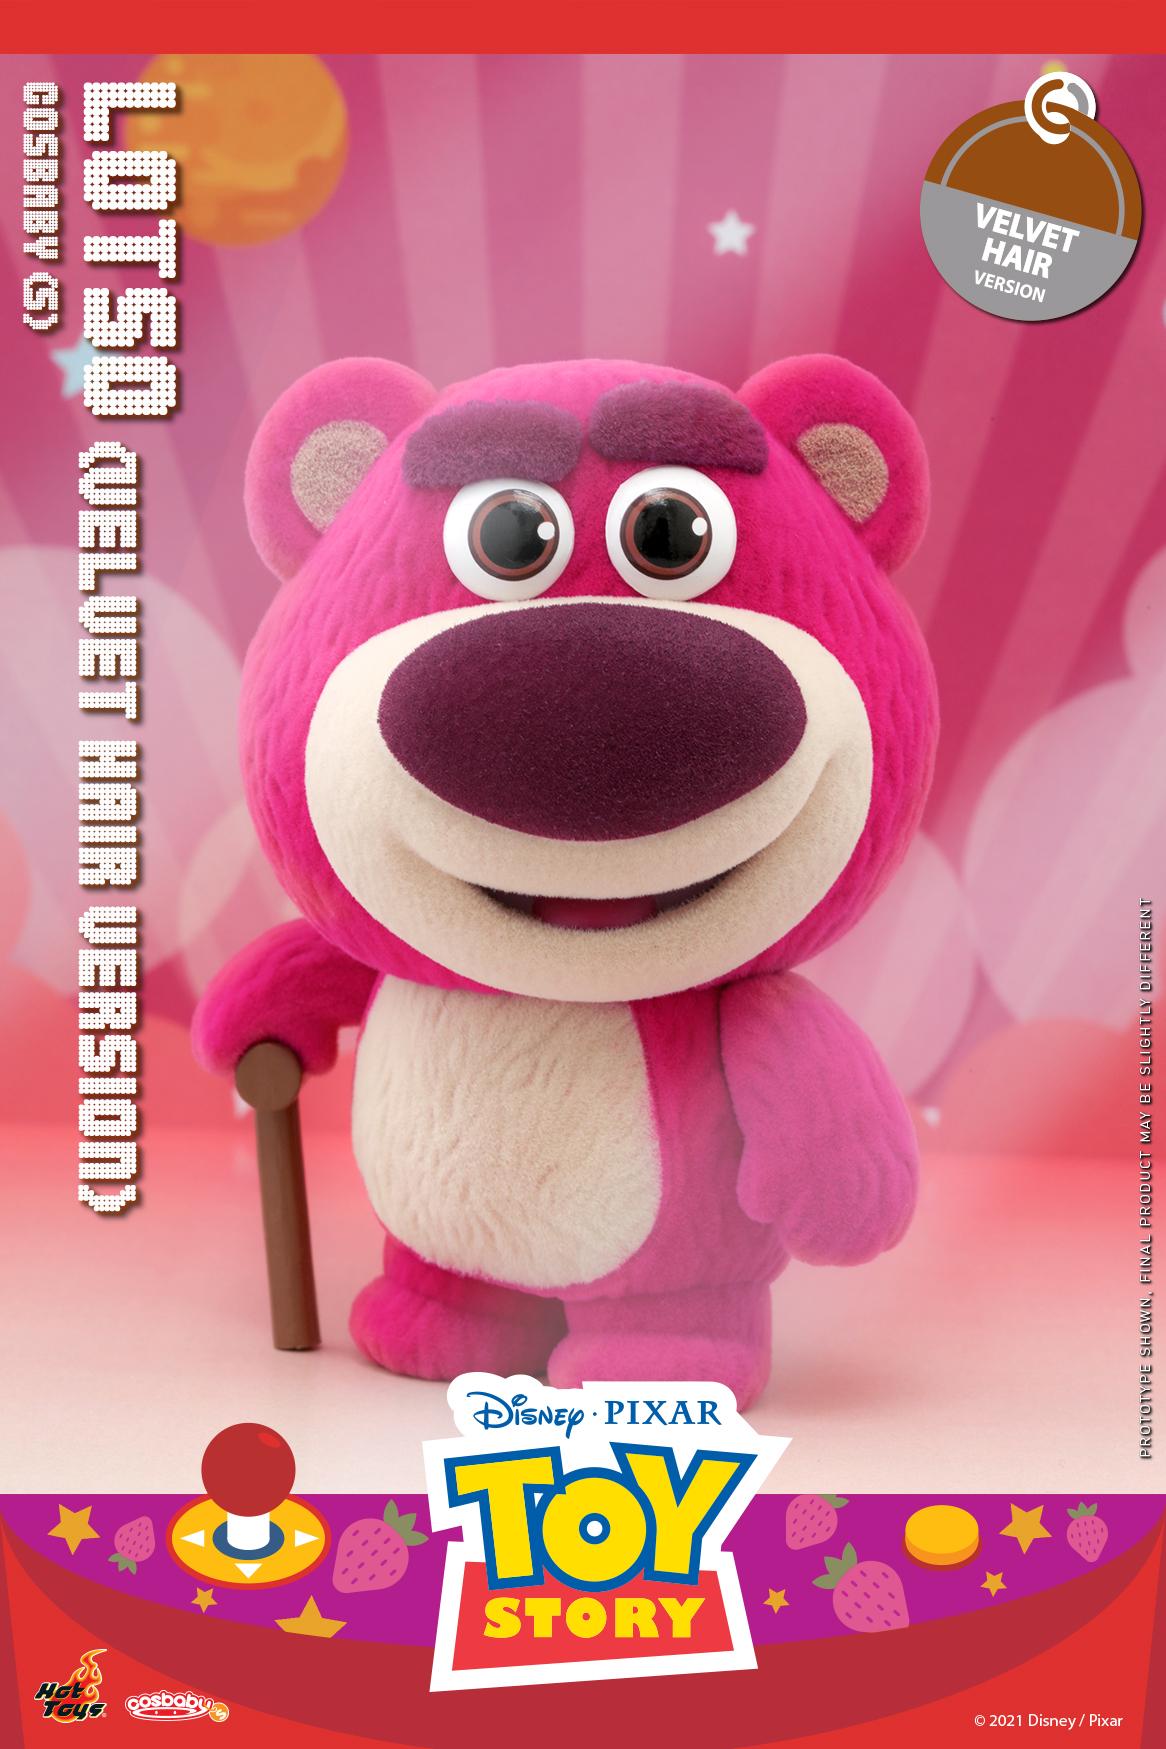 Hot Toys - Toy Story - Lotso (Velet Hair Version) Cosbaby_PR2